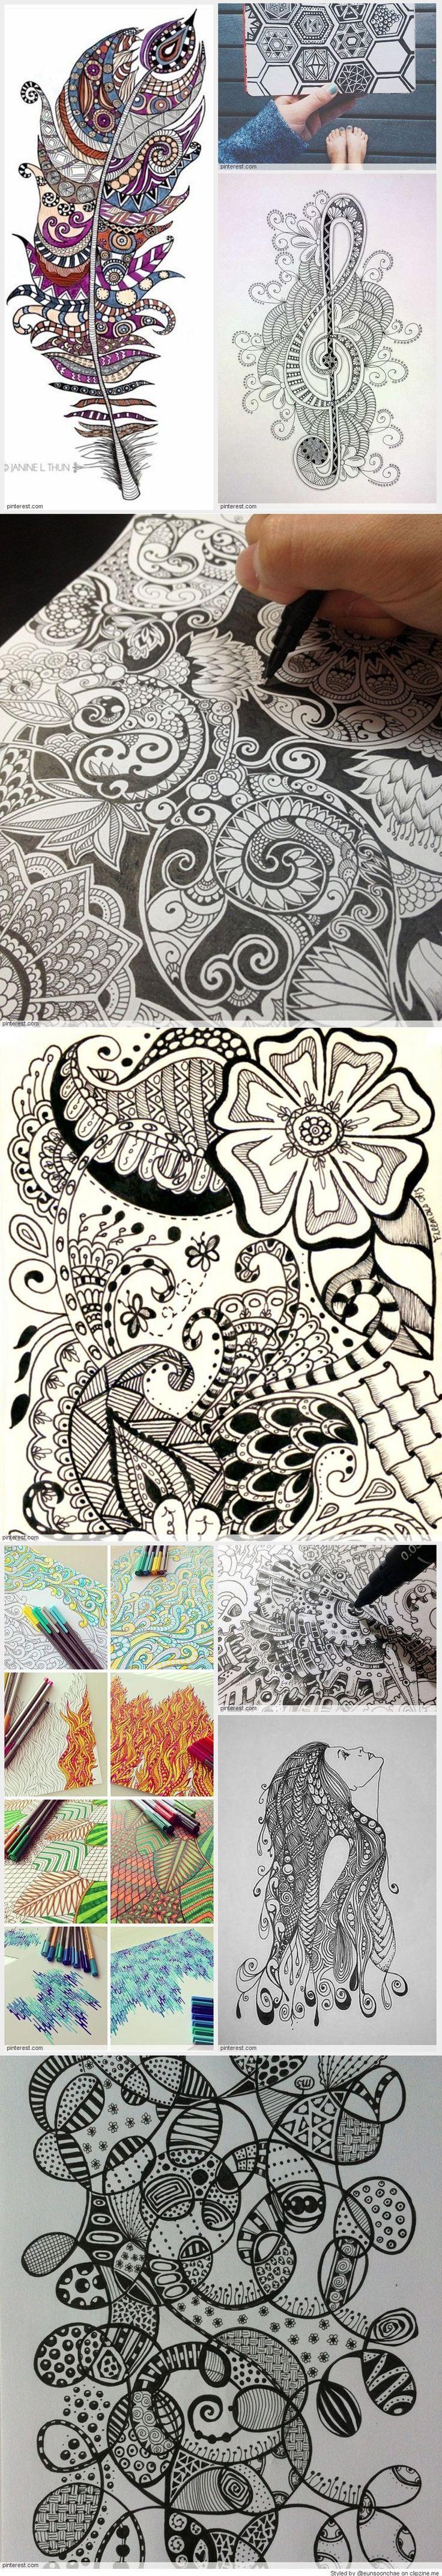 Zentangle Patterns: